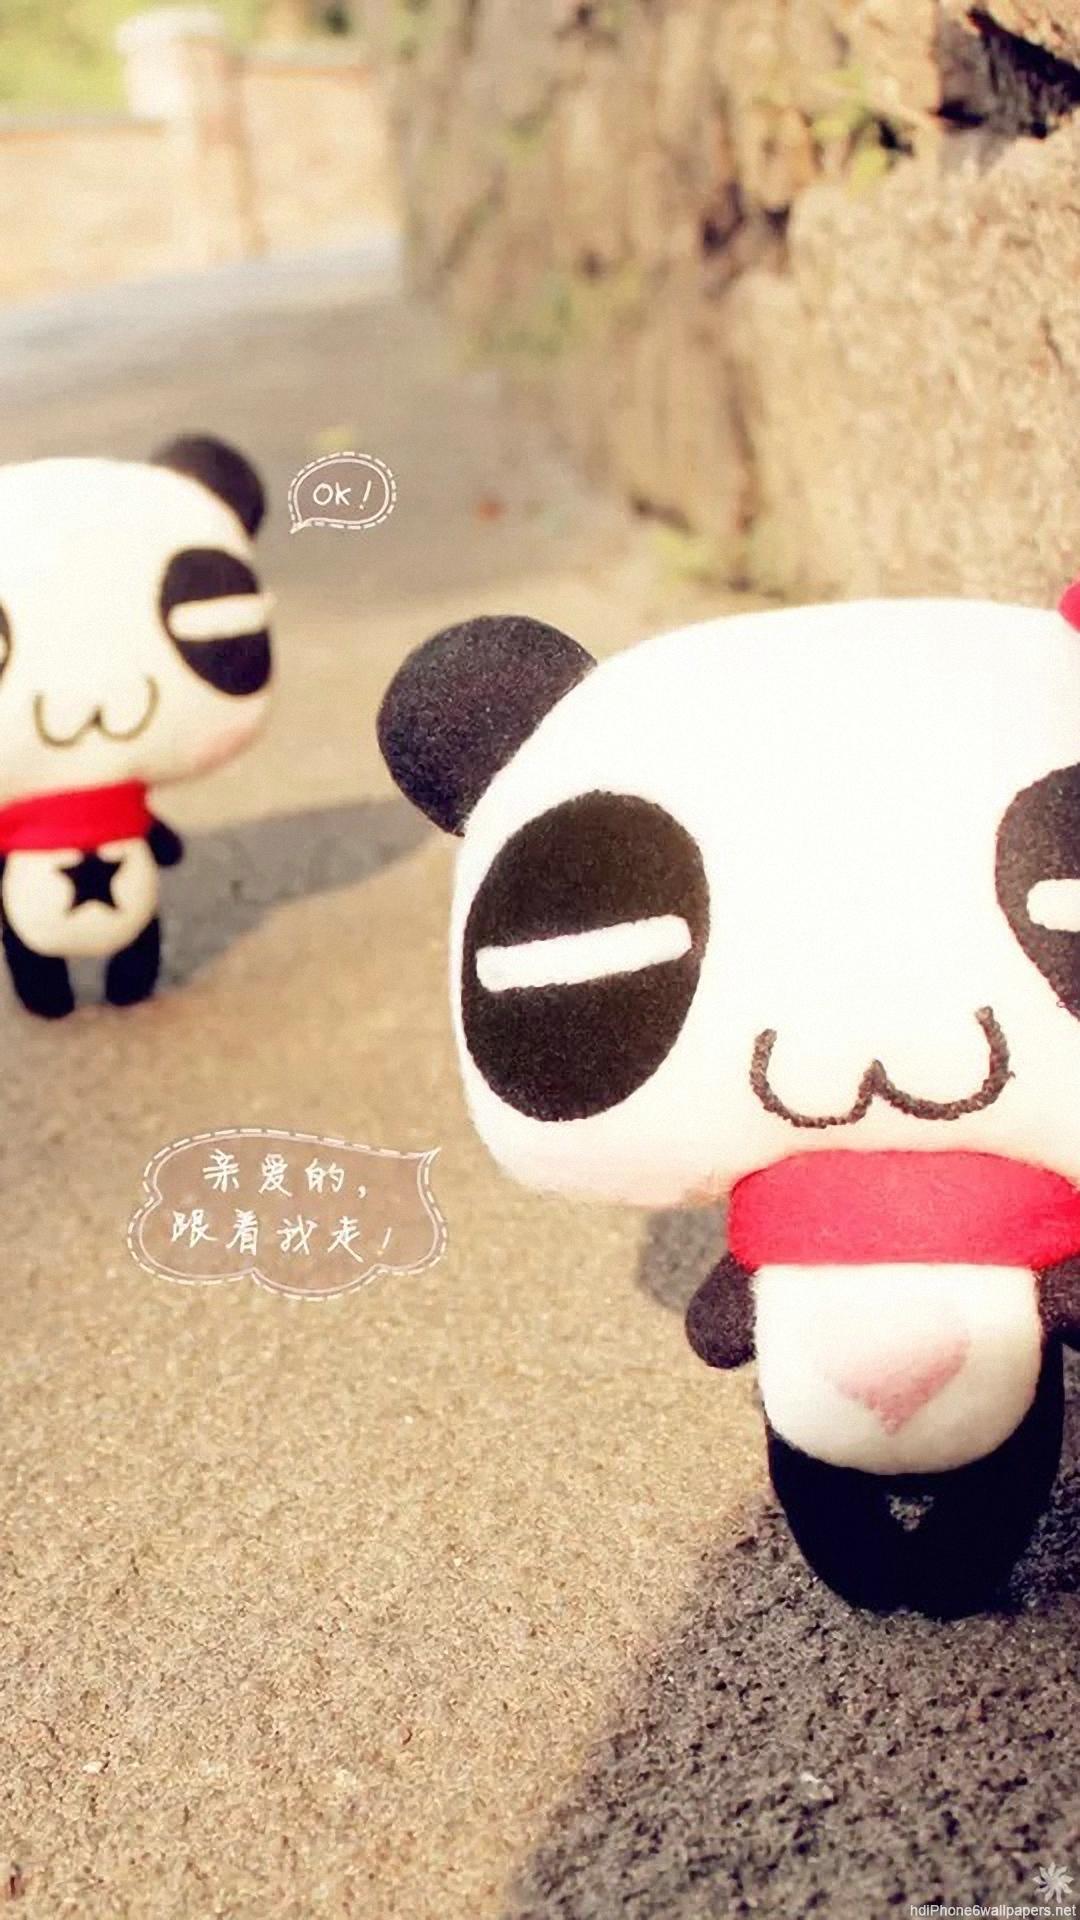 Panda Love Japan Android Wallpaper Android Hd Wallpapers